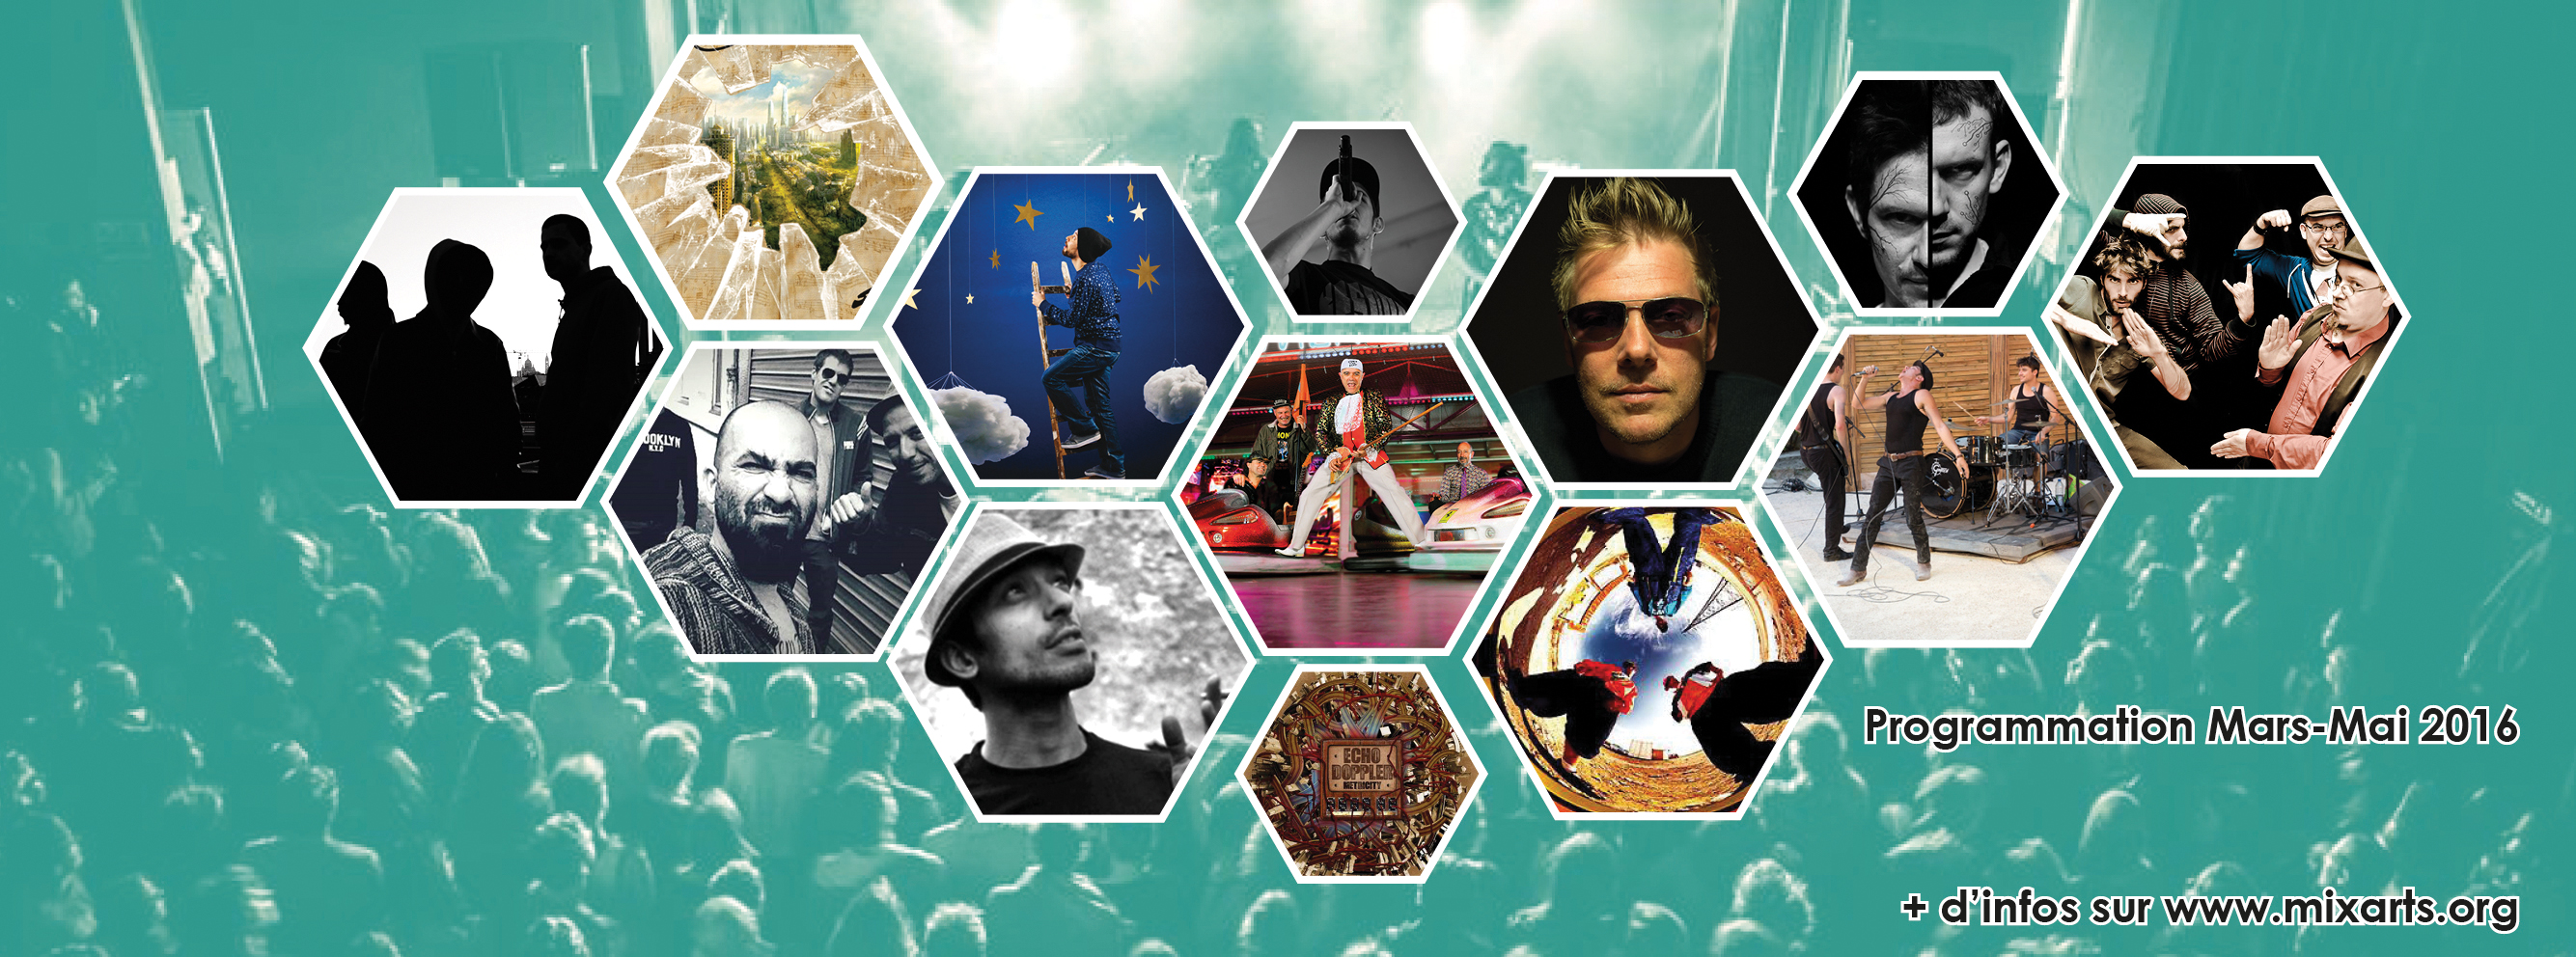 Programmation mars - mai 2016 / Association Mix'Arts